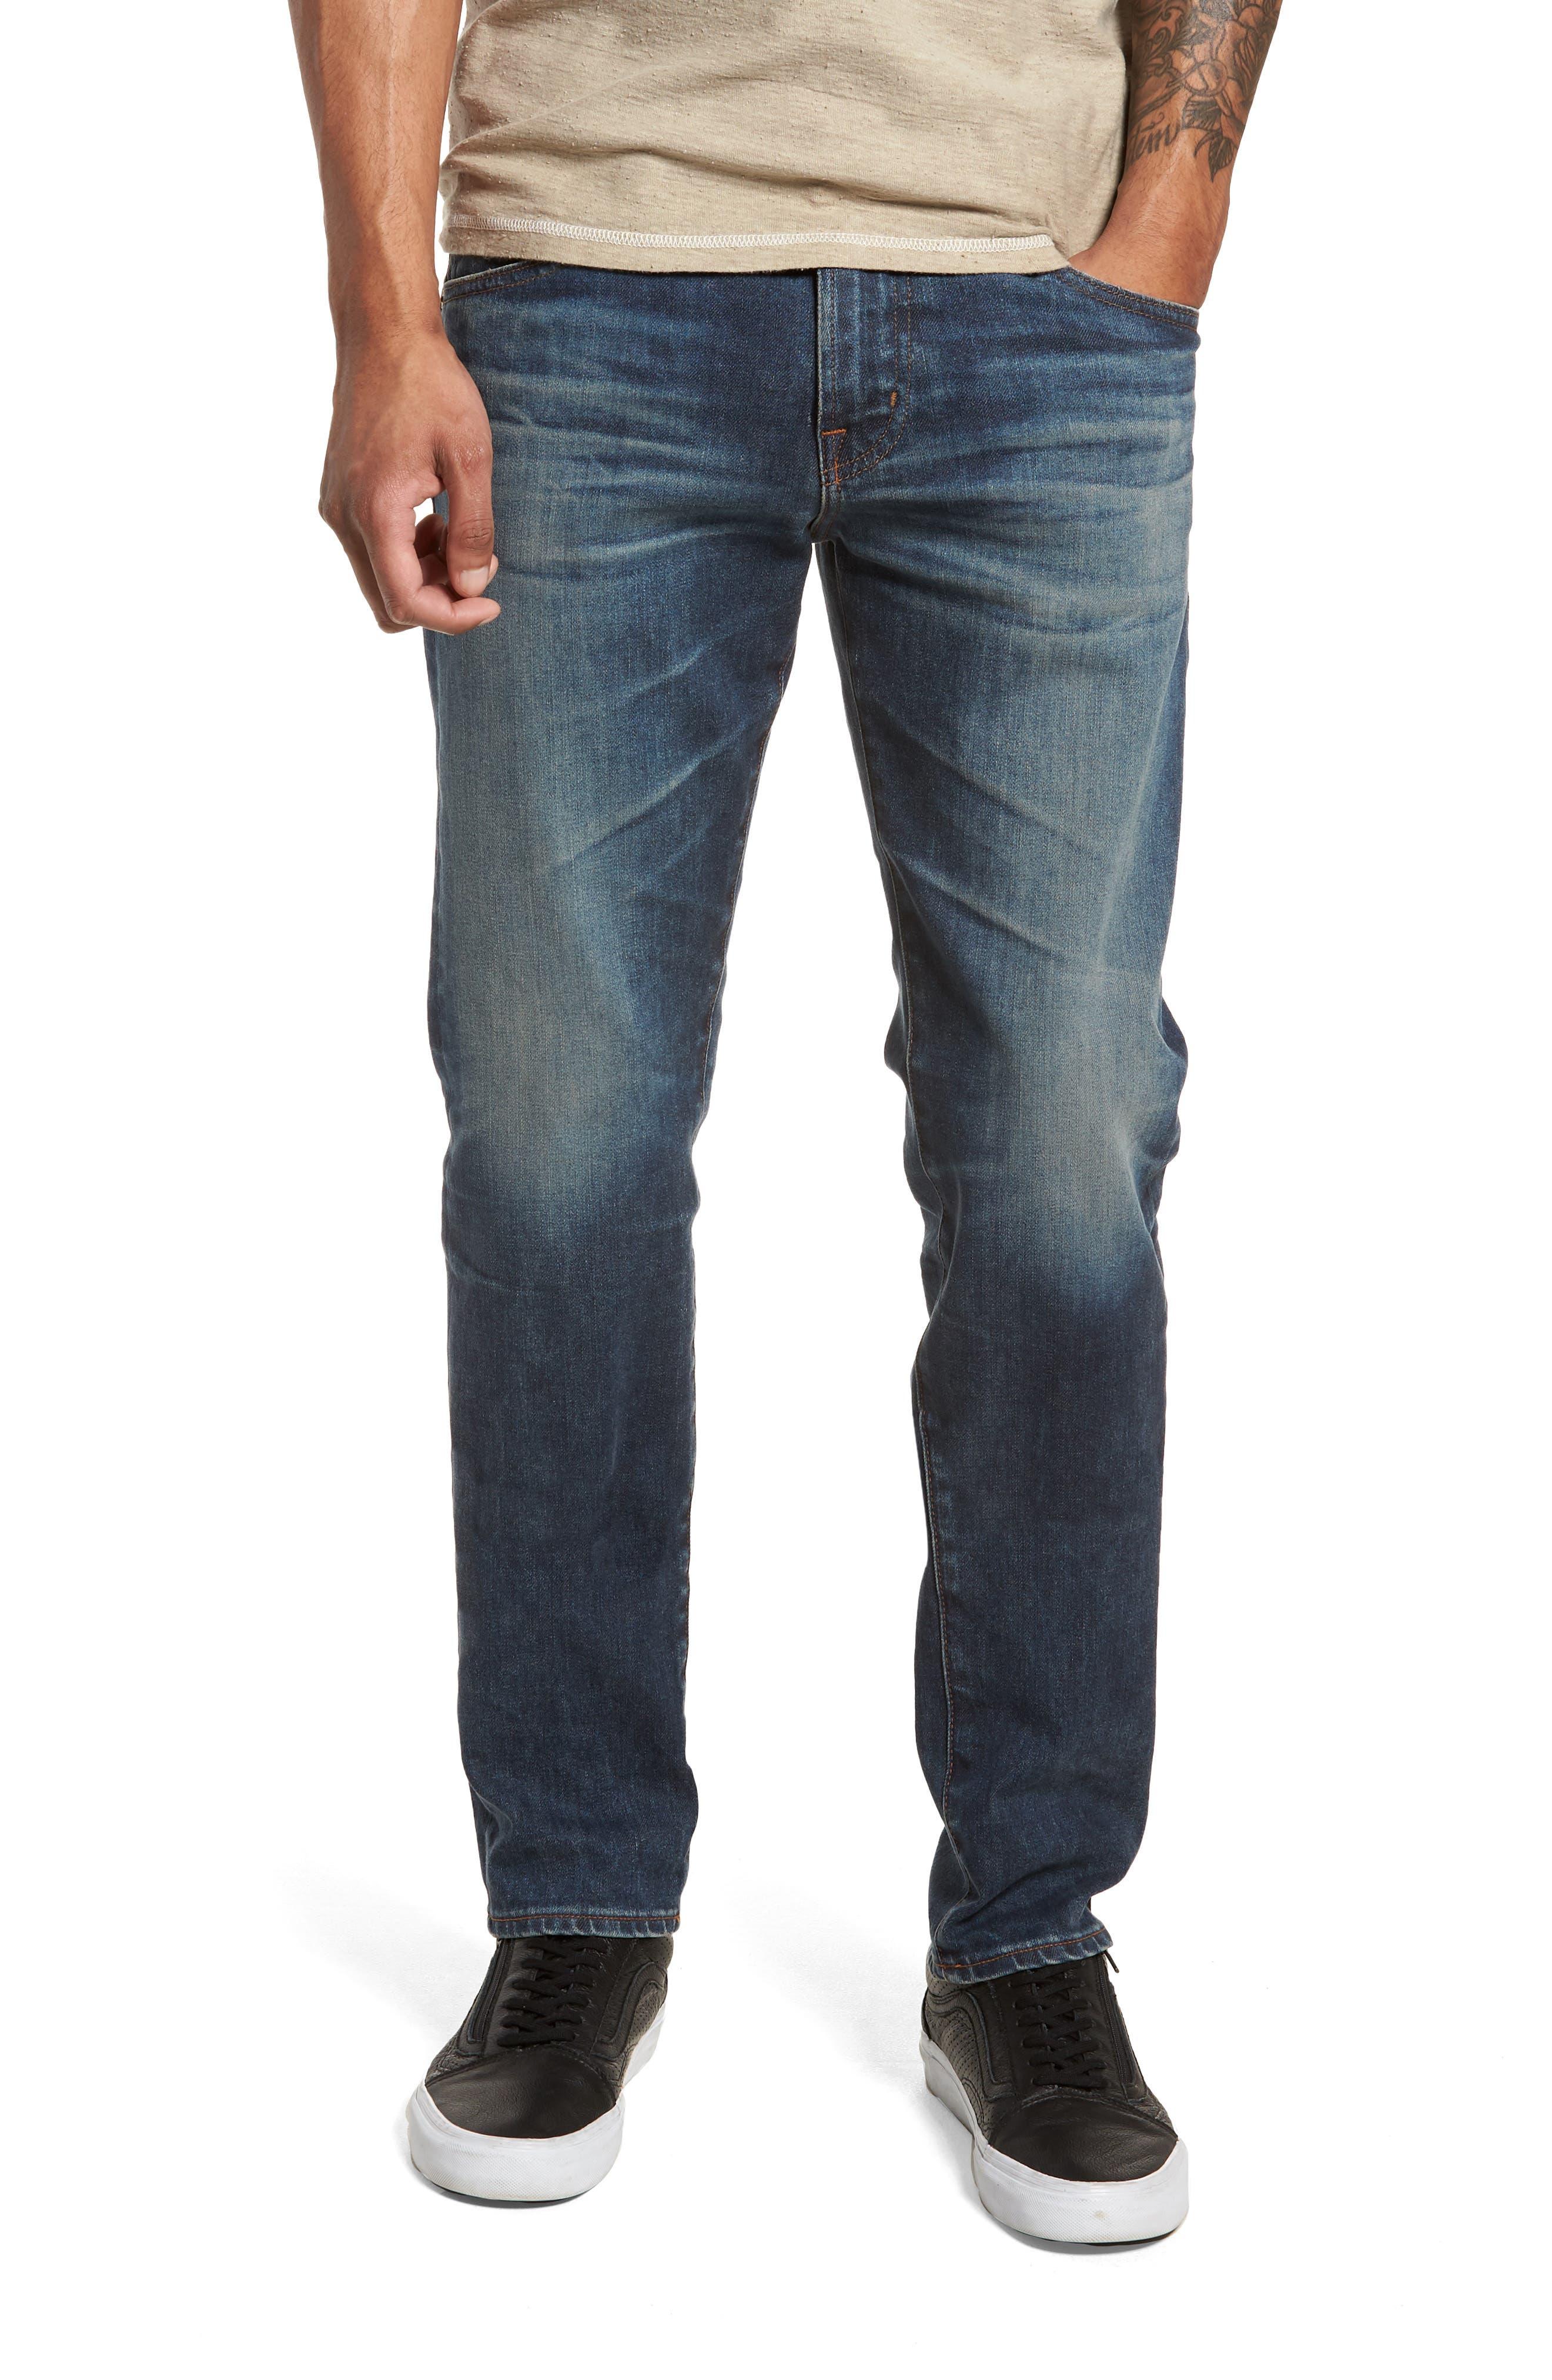 Dylan Slim Skinny Fit Jeans,                         Main,                         color, 12 Years River Veil